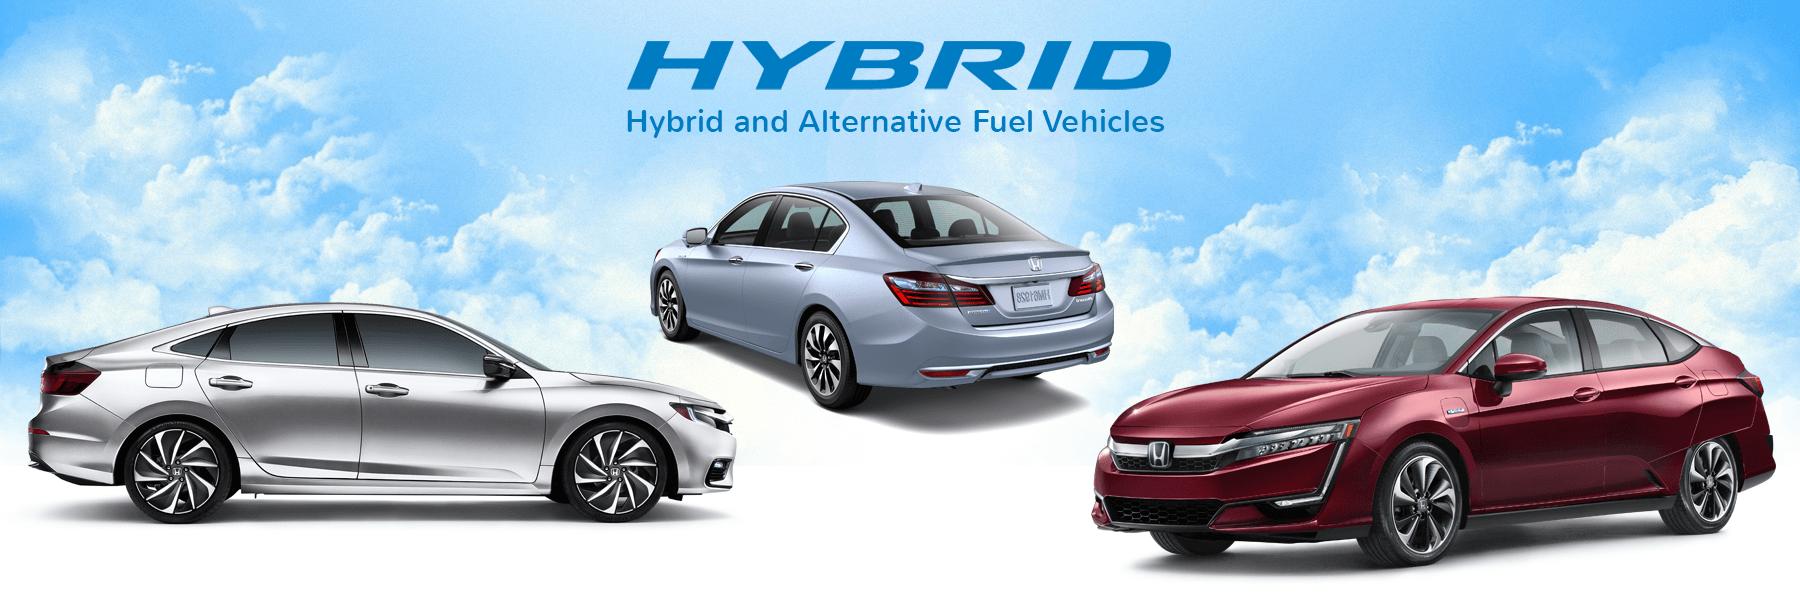 Honda Hybrids and Alternative Fuel Vehicles